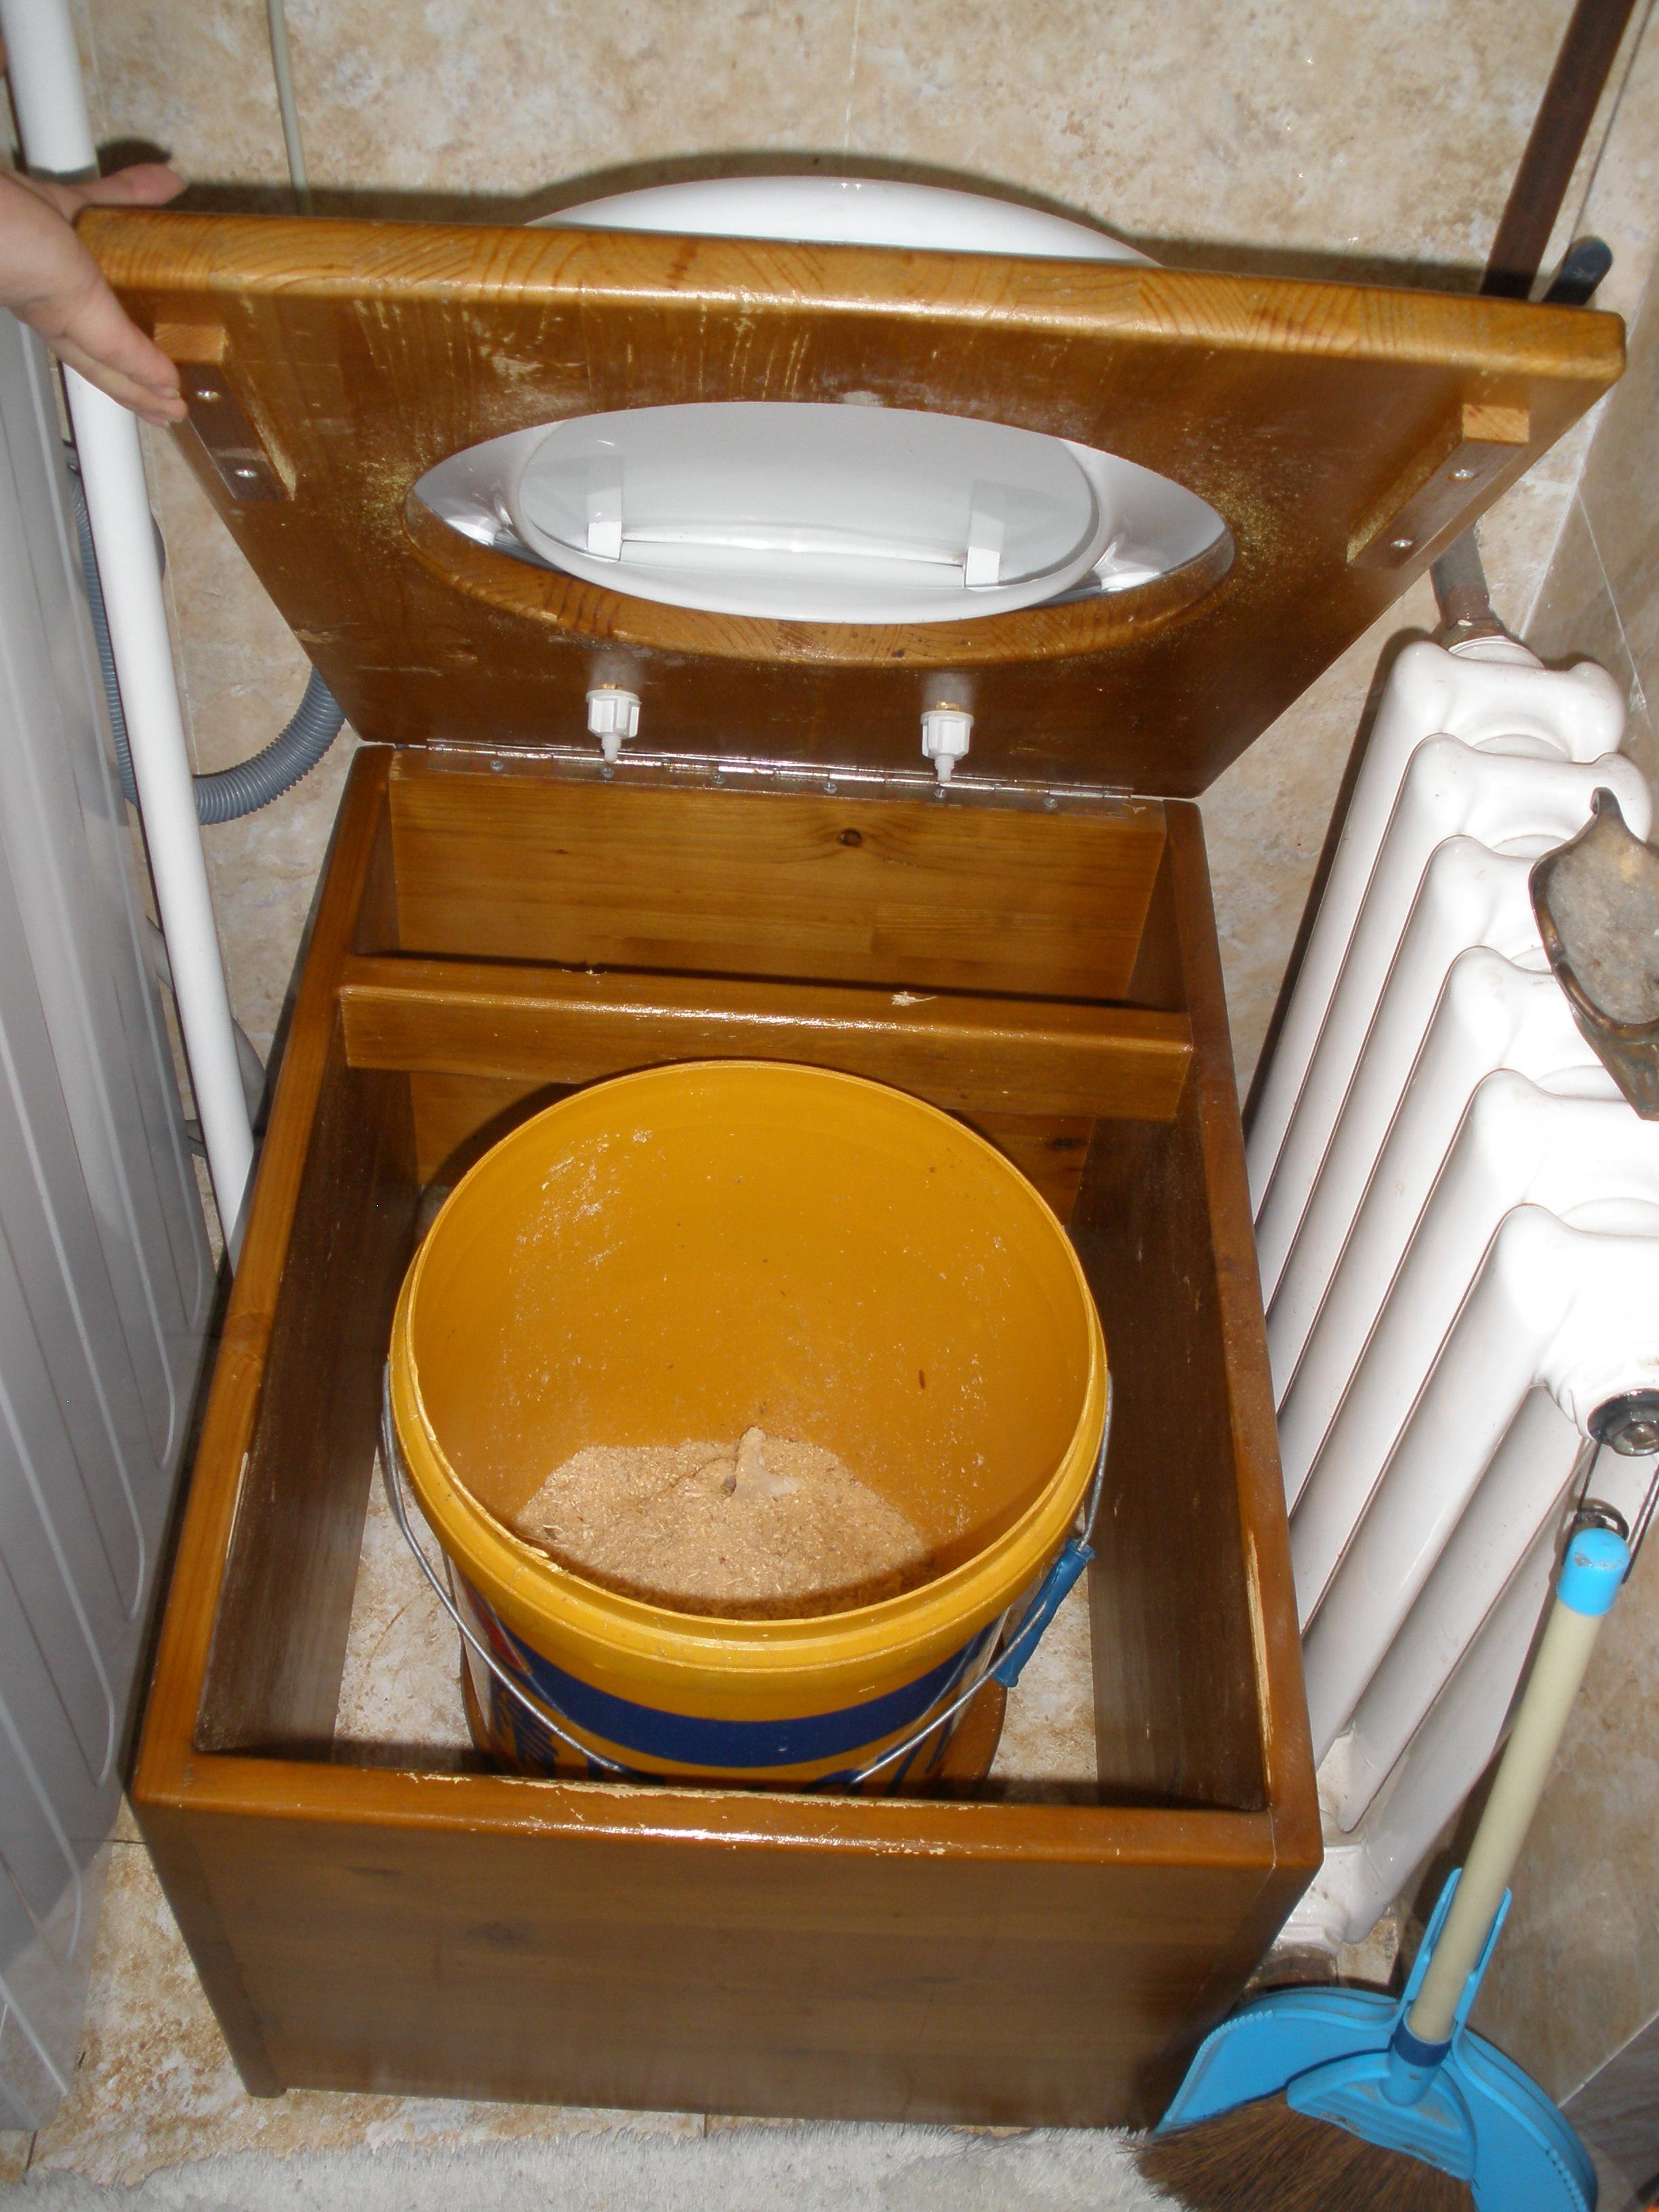 Wonderful File:Humanure Dry Toilet Inside View, Mongolian Family House, Ulaan Baatar  2010,